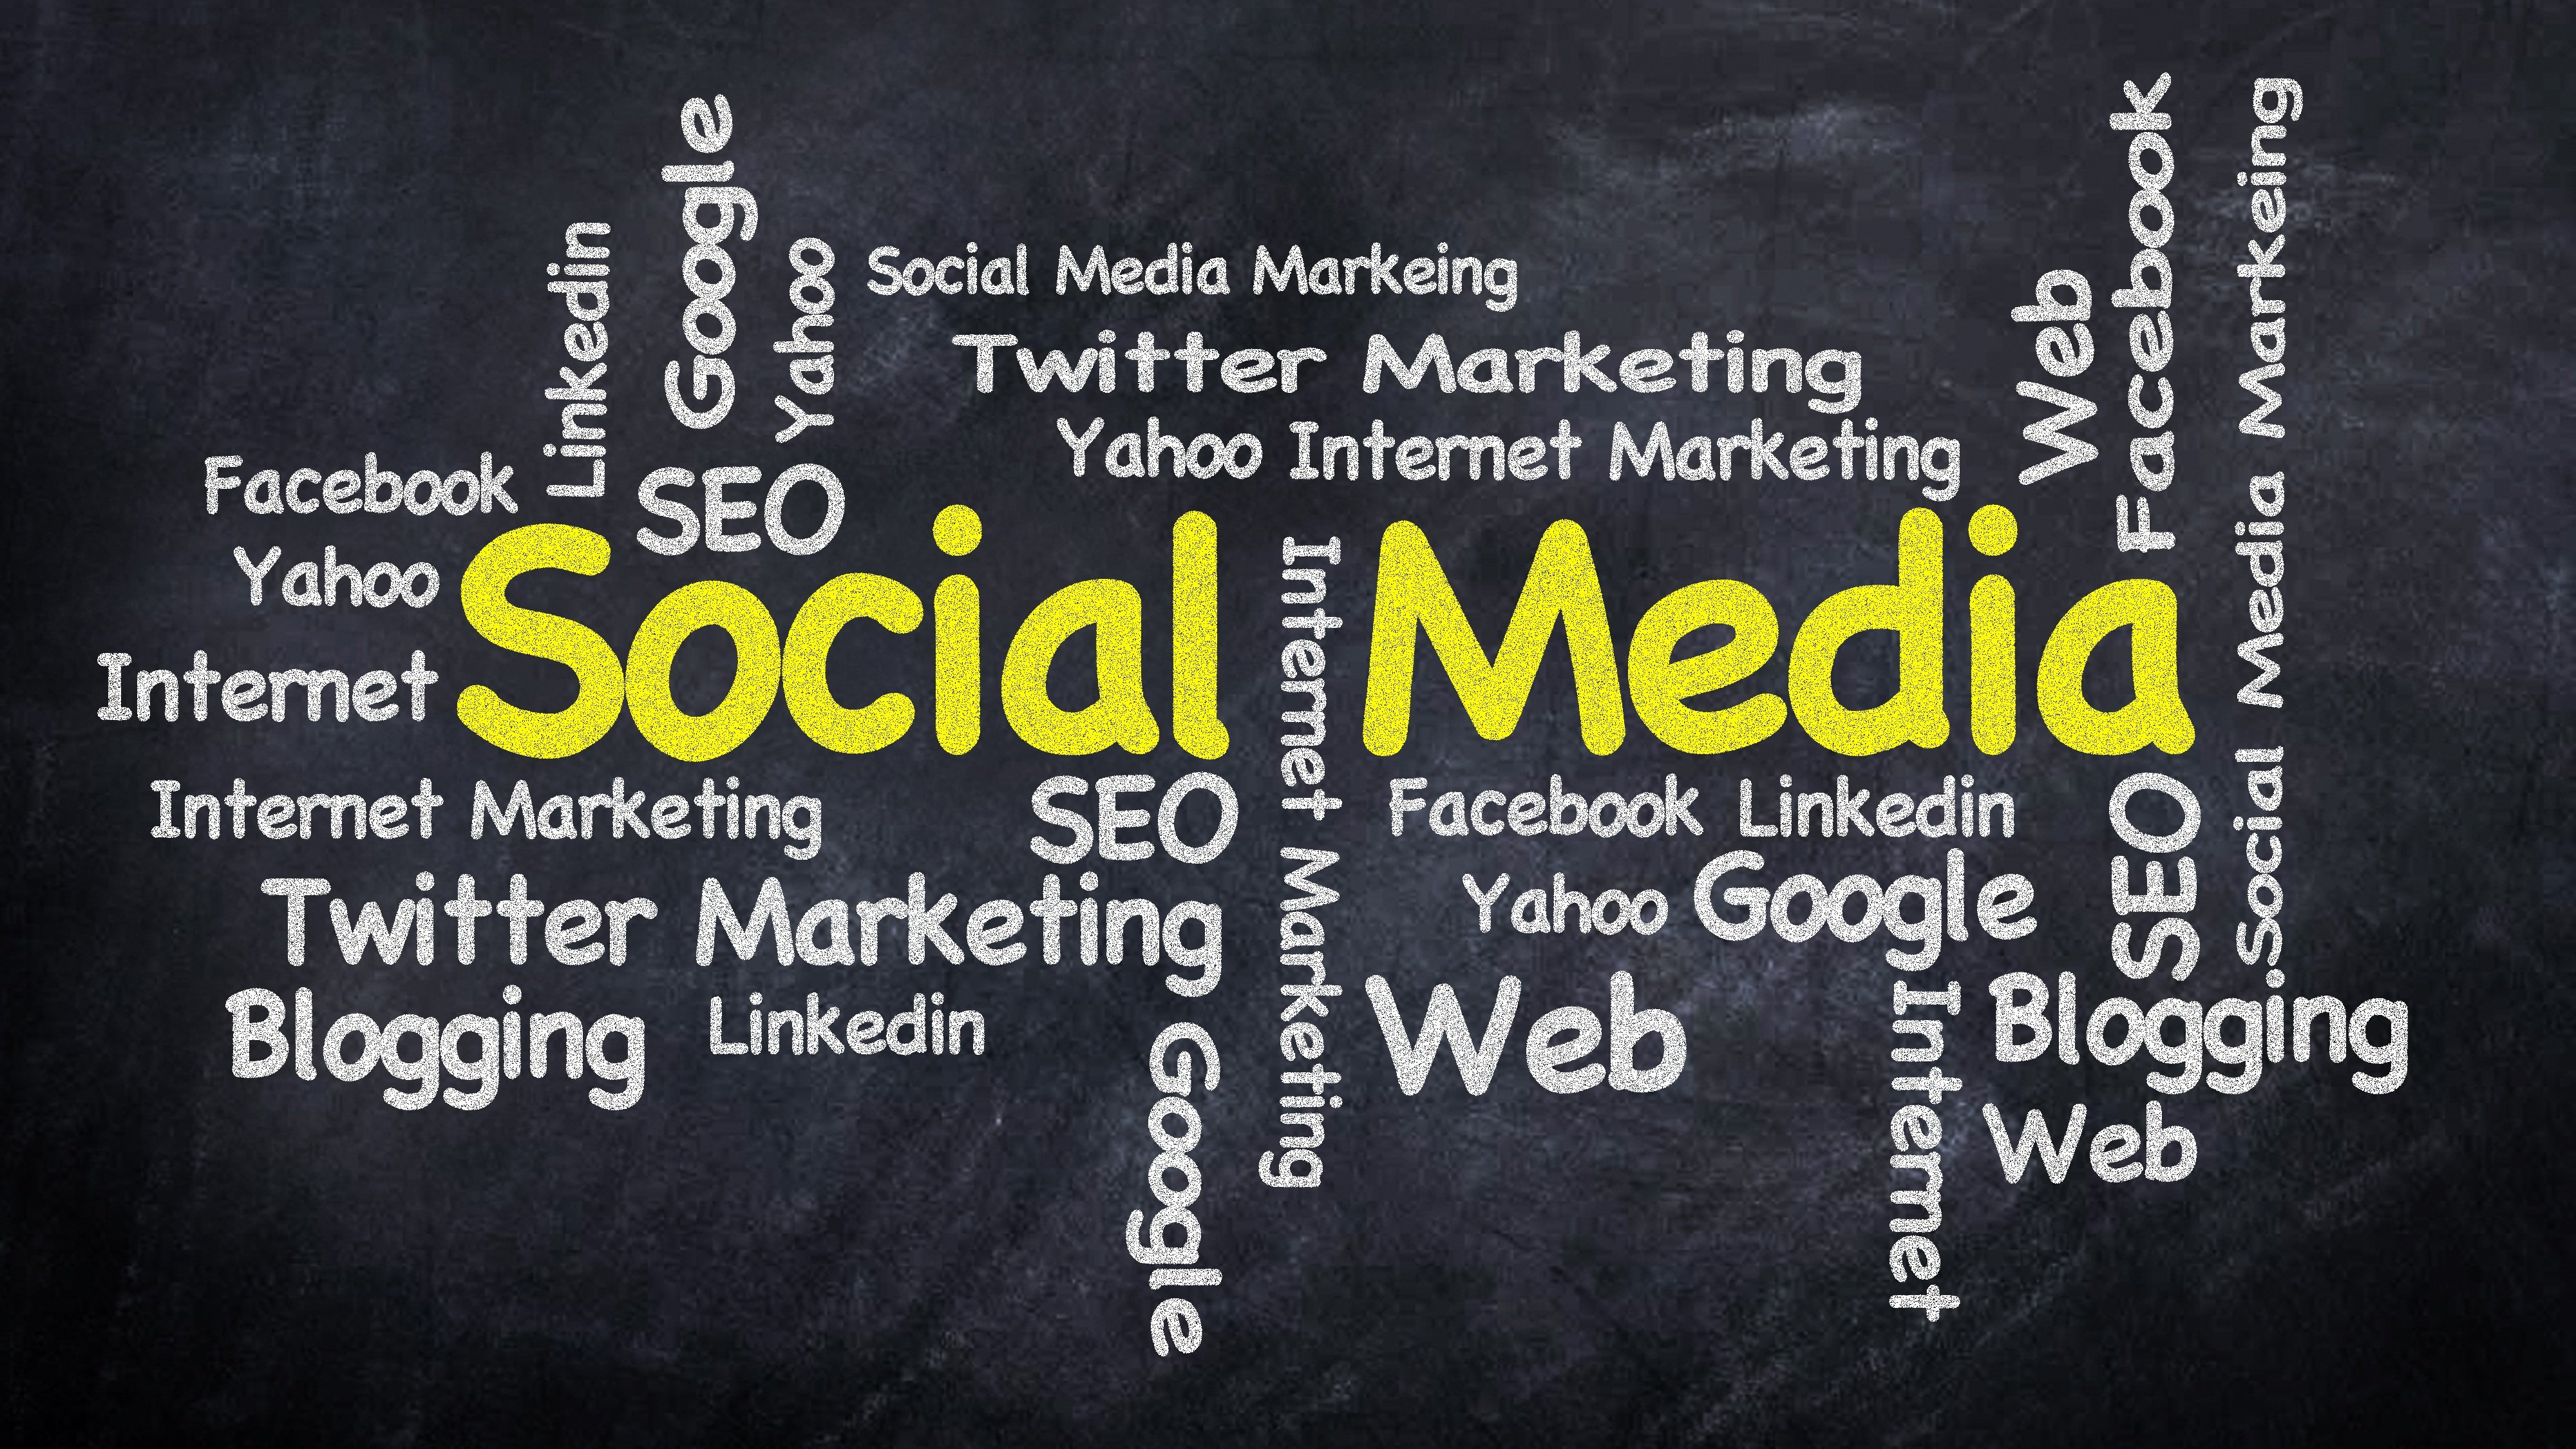 social media marketing typography banner 4k uhd cool wallpapers HD 4000x2250